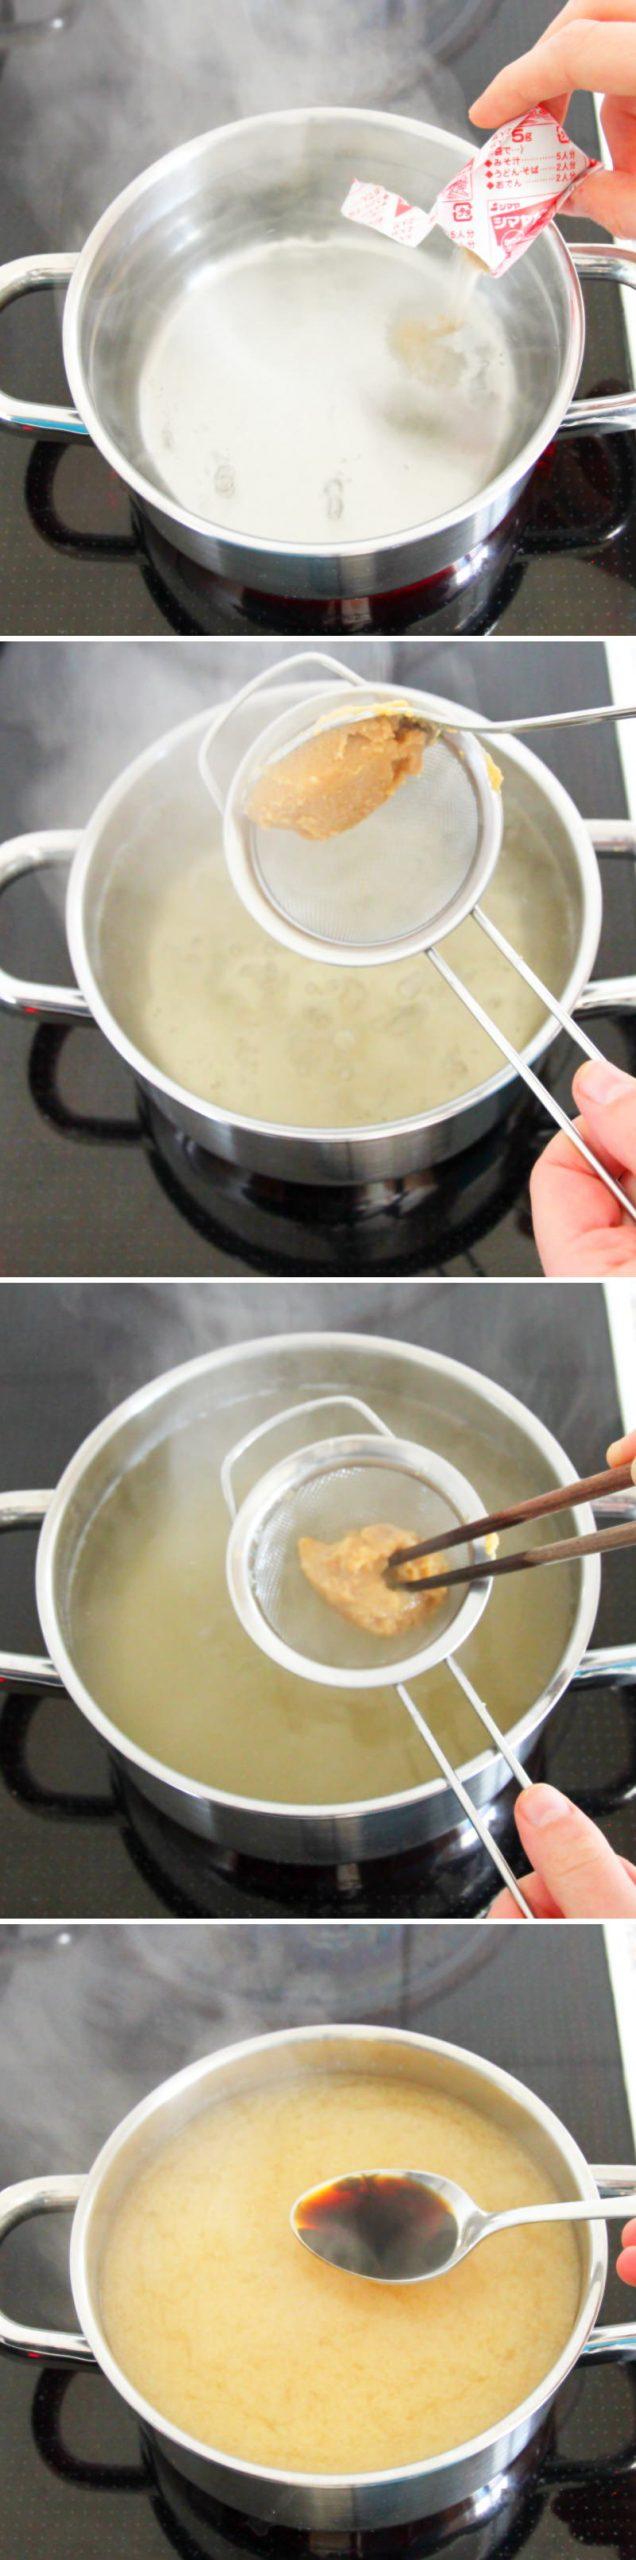 Miso Ramen Schritt 4 Brühe zubereiten